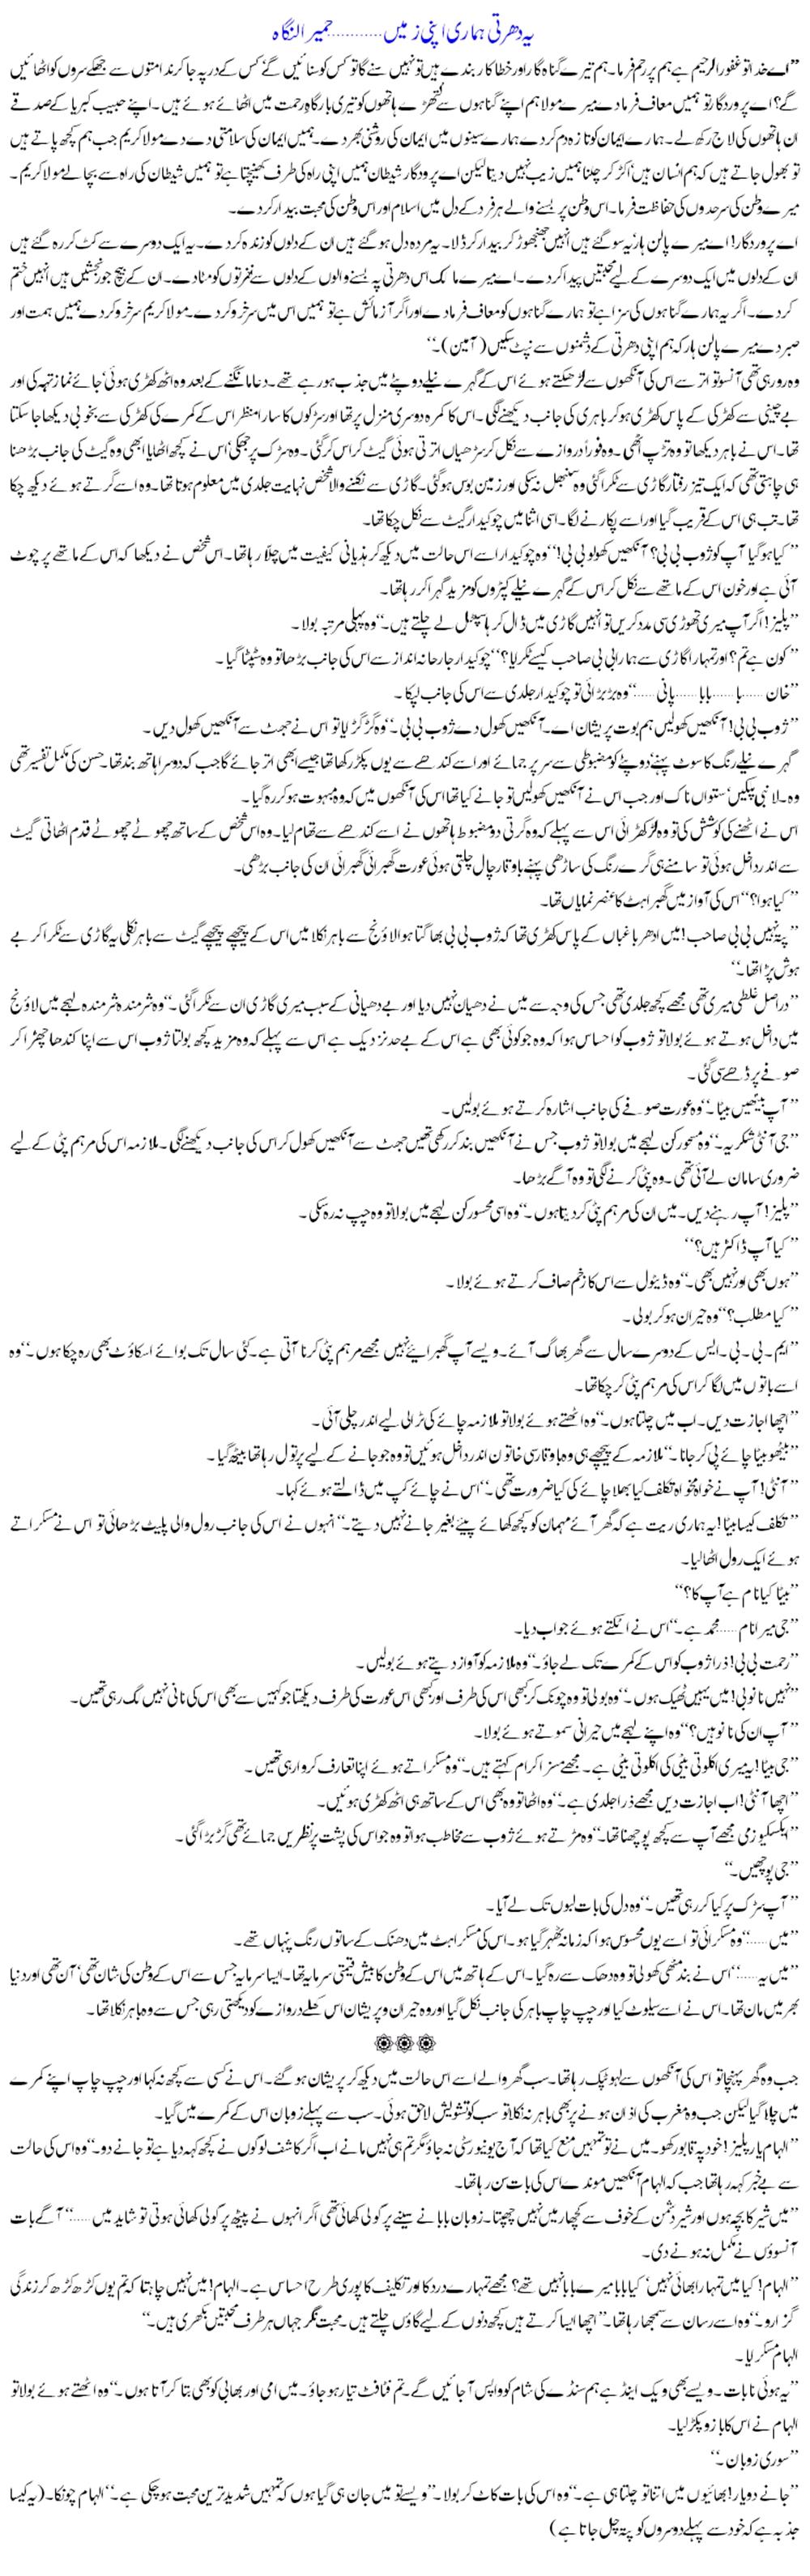 an accident essay in urdu